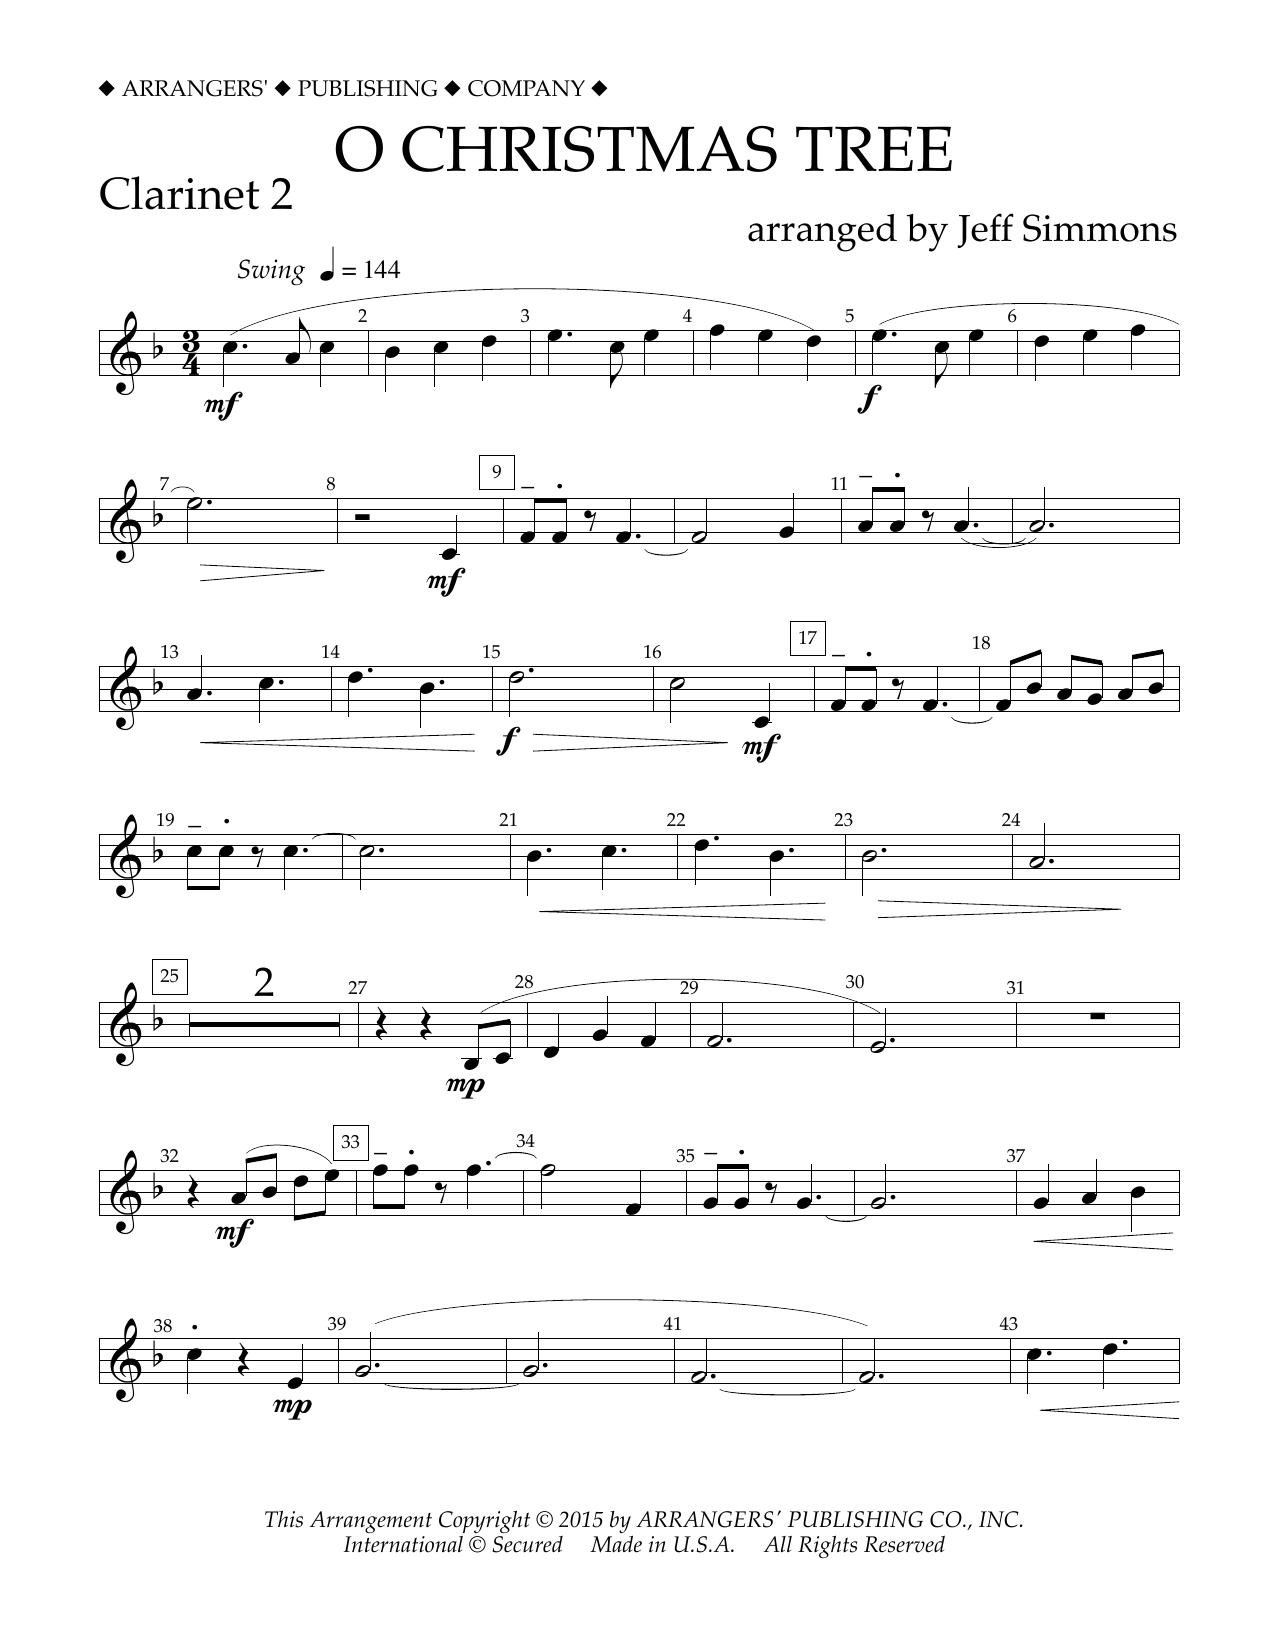 O Christmas Tree - Bb Clarinet 2 at Stanton\'s Sheet Music